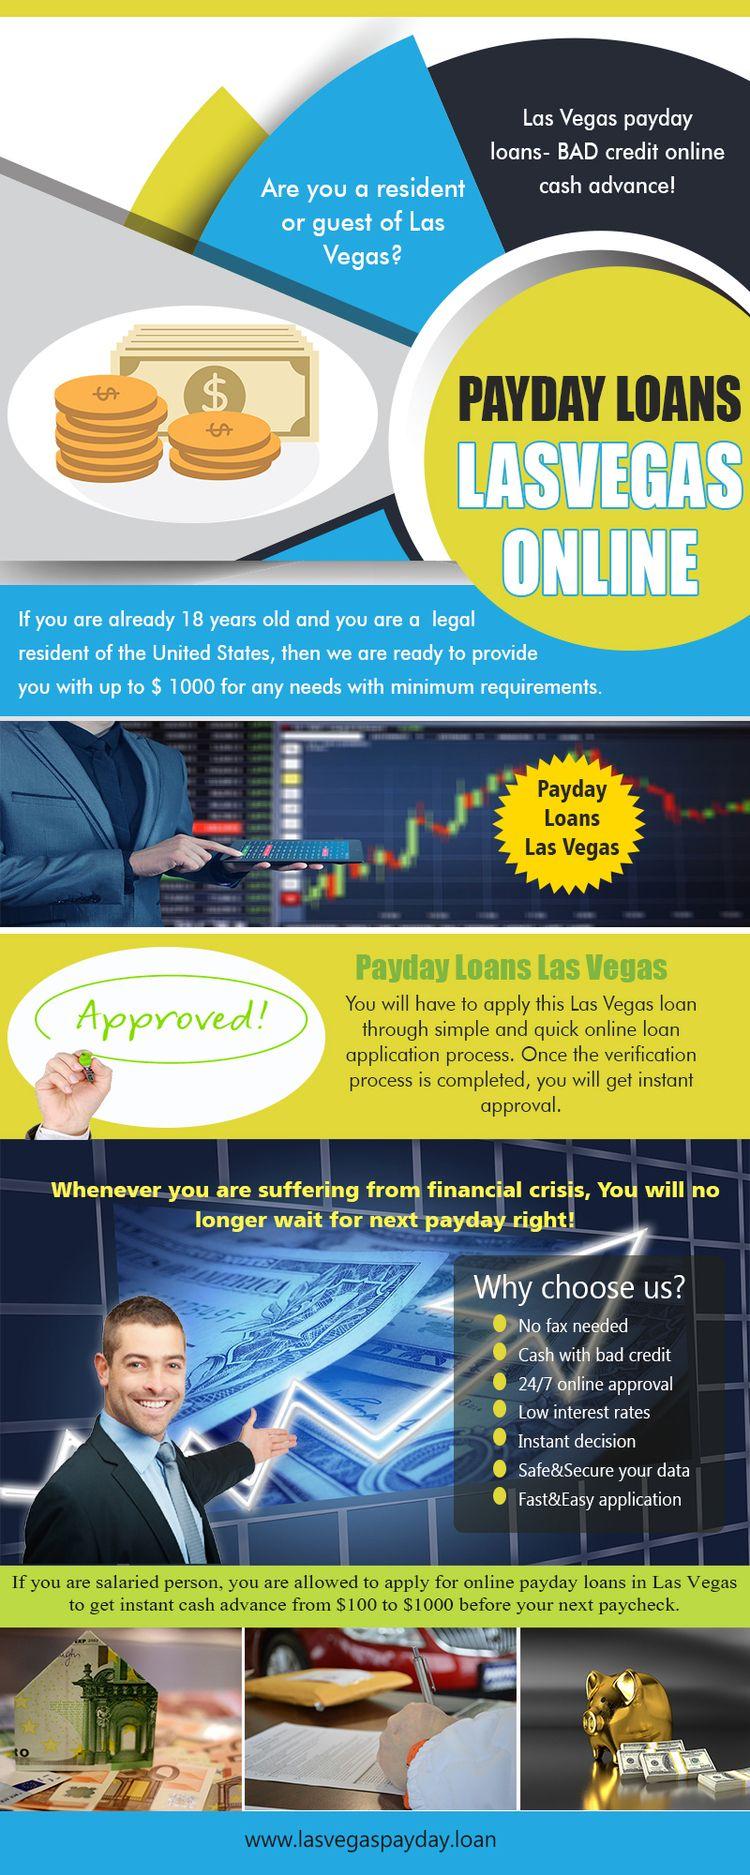 payday loans lasvegas Apply tod - lasvegaspayday | ello